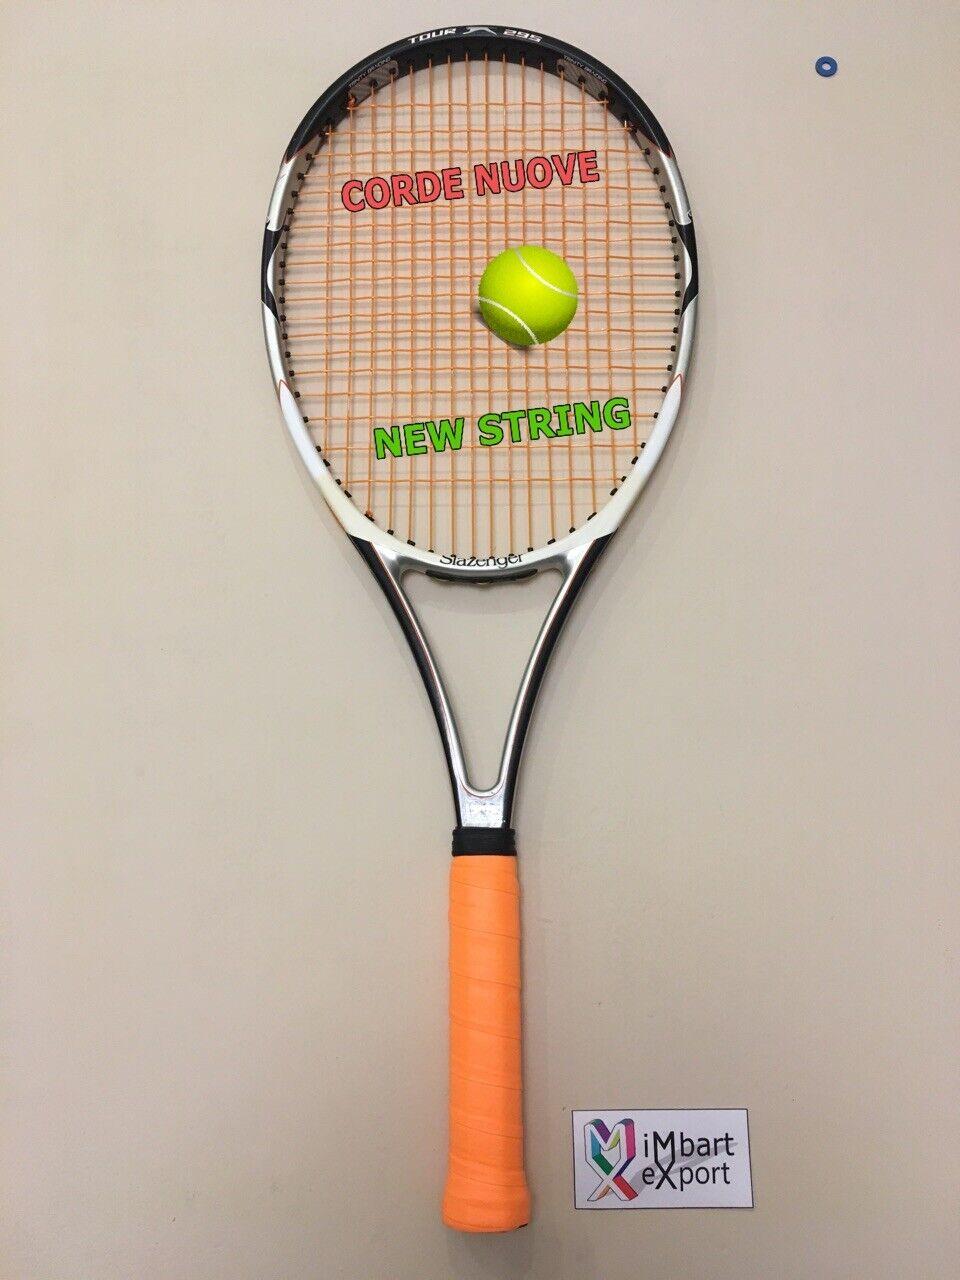 SLAZENGER CHALLENGE N.1 TOUR 295 98 16x19  L3 Racchetta Tennis Racket  de moda